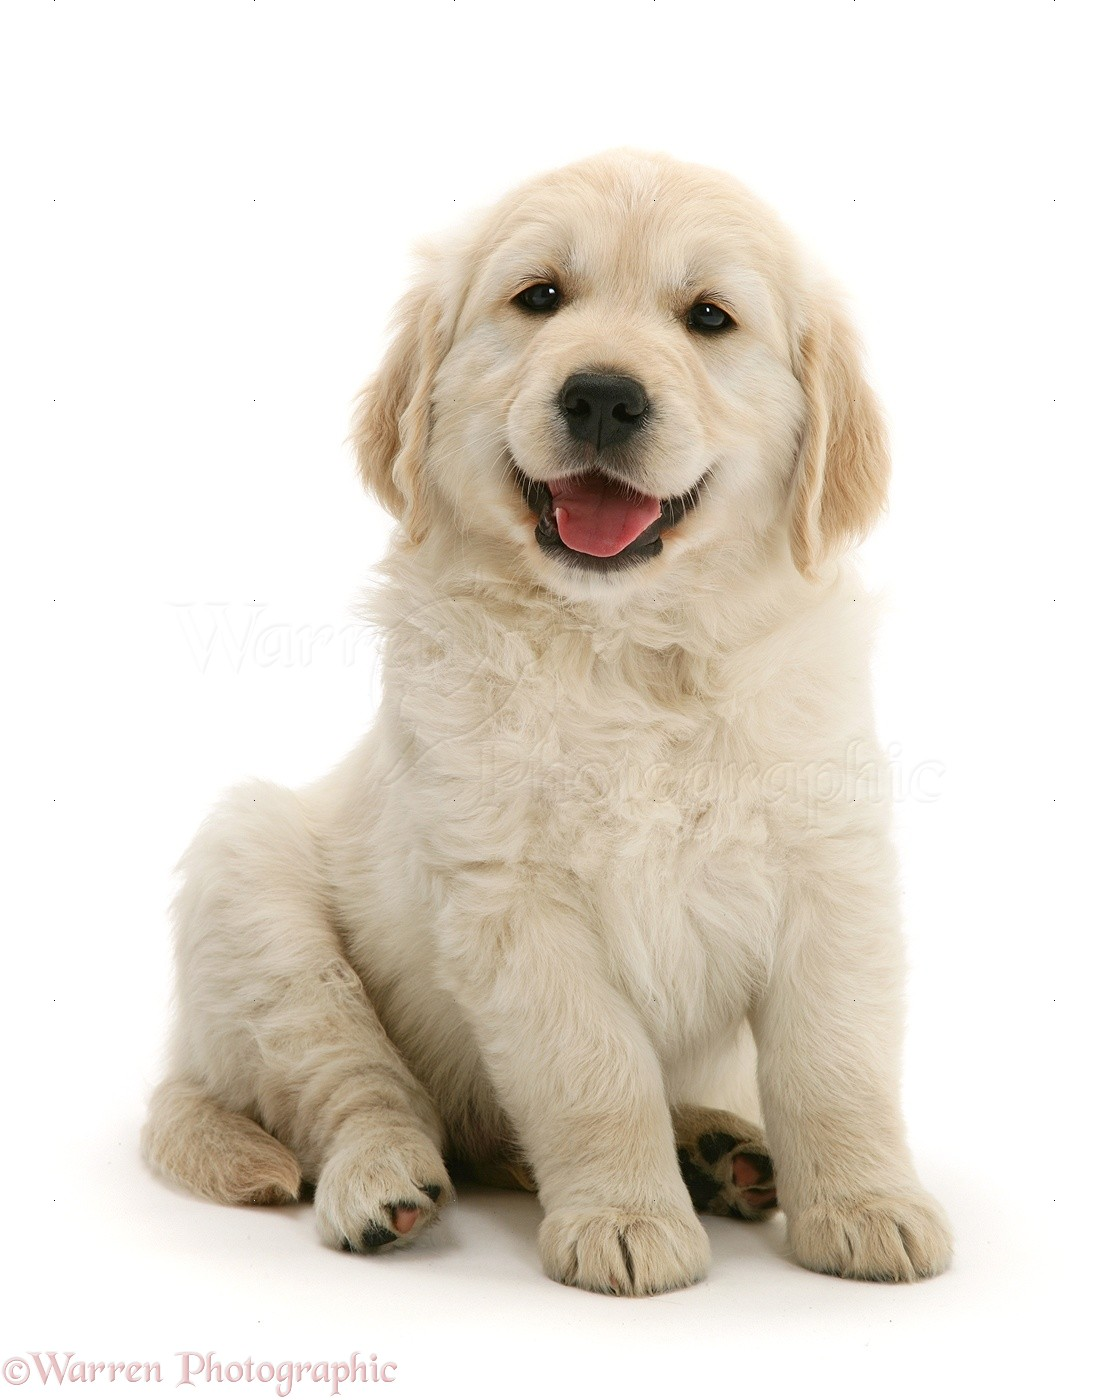 Dog: Smiley Golden Retriever puppy photo WP40845